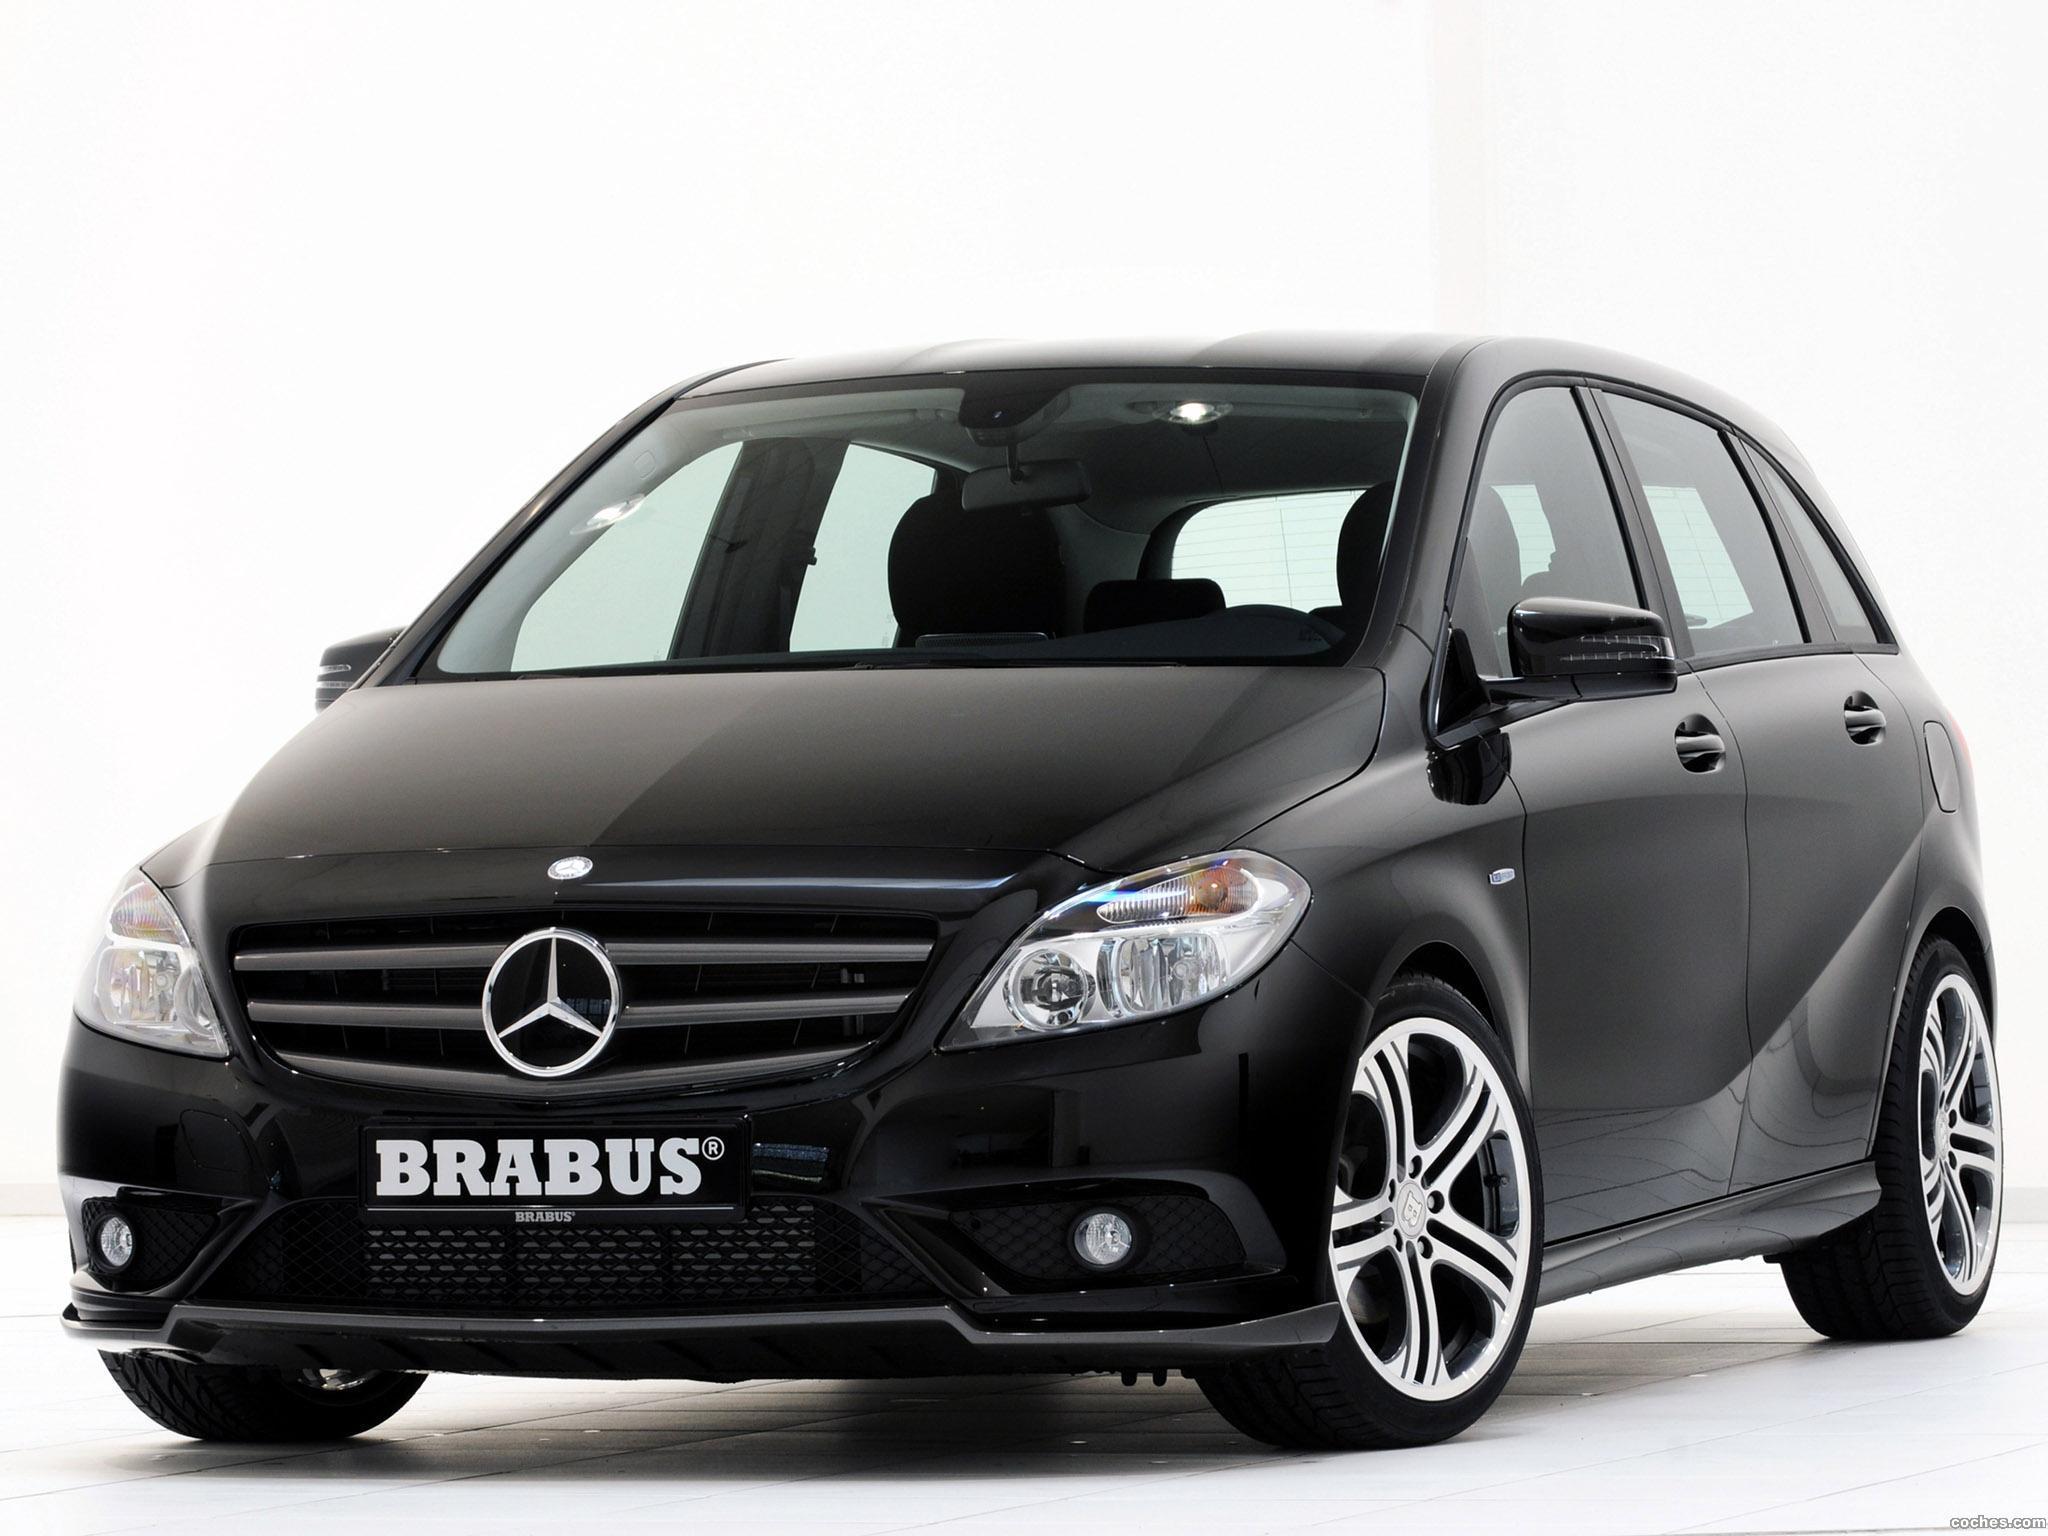 brabus_mercedes-b-klasse-w246-2012_r8